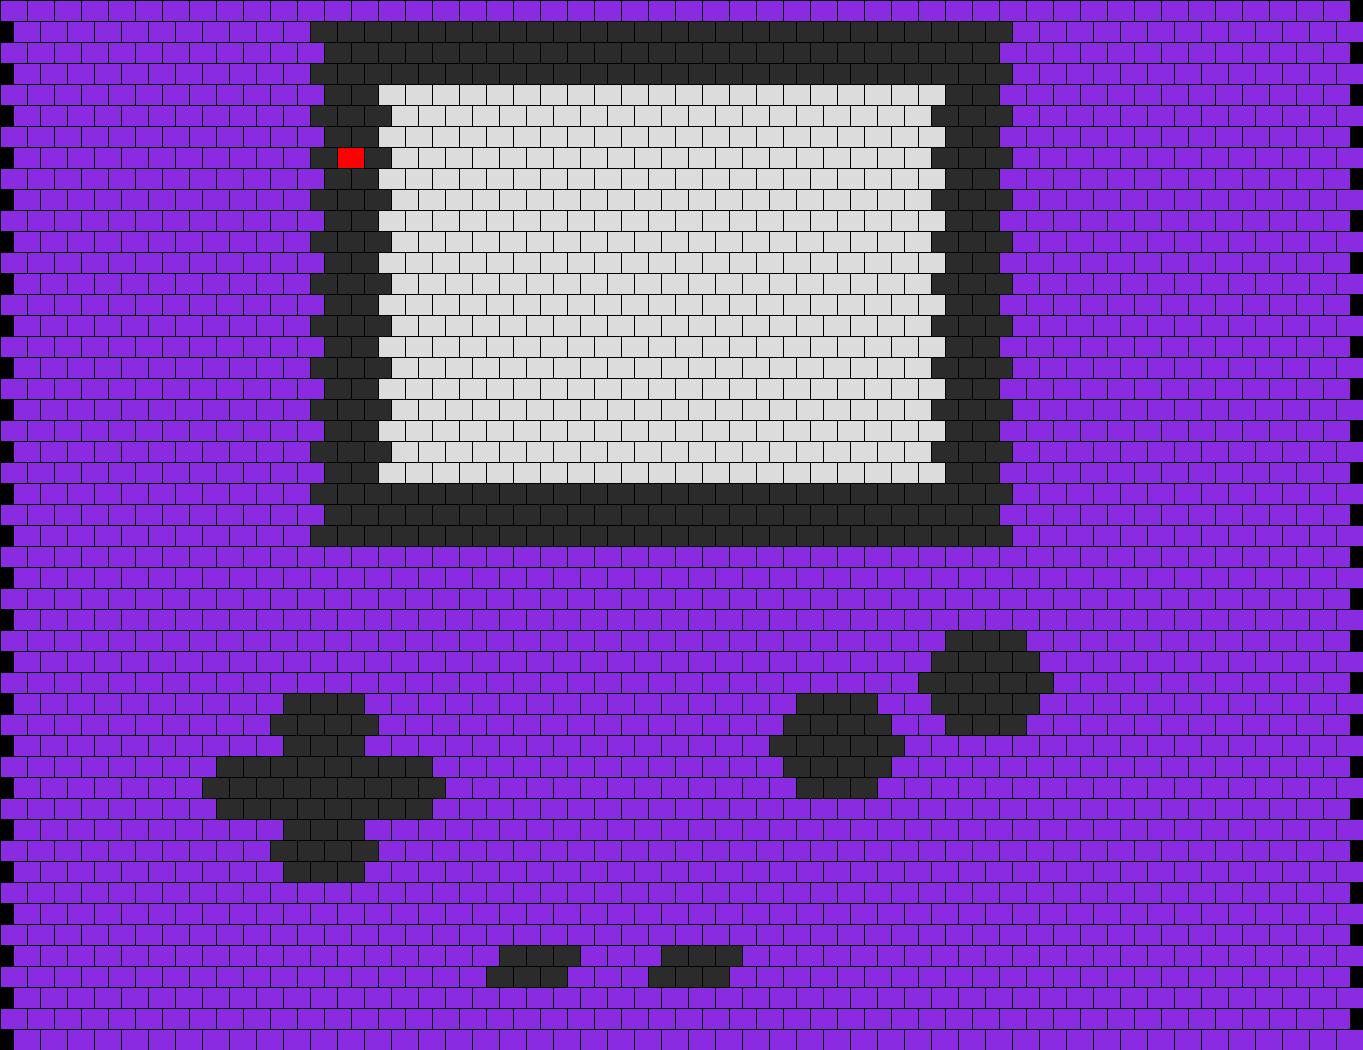 Game boy bag panel